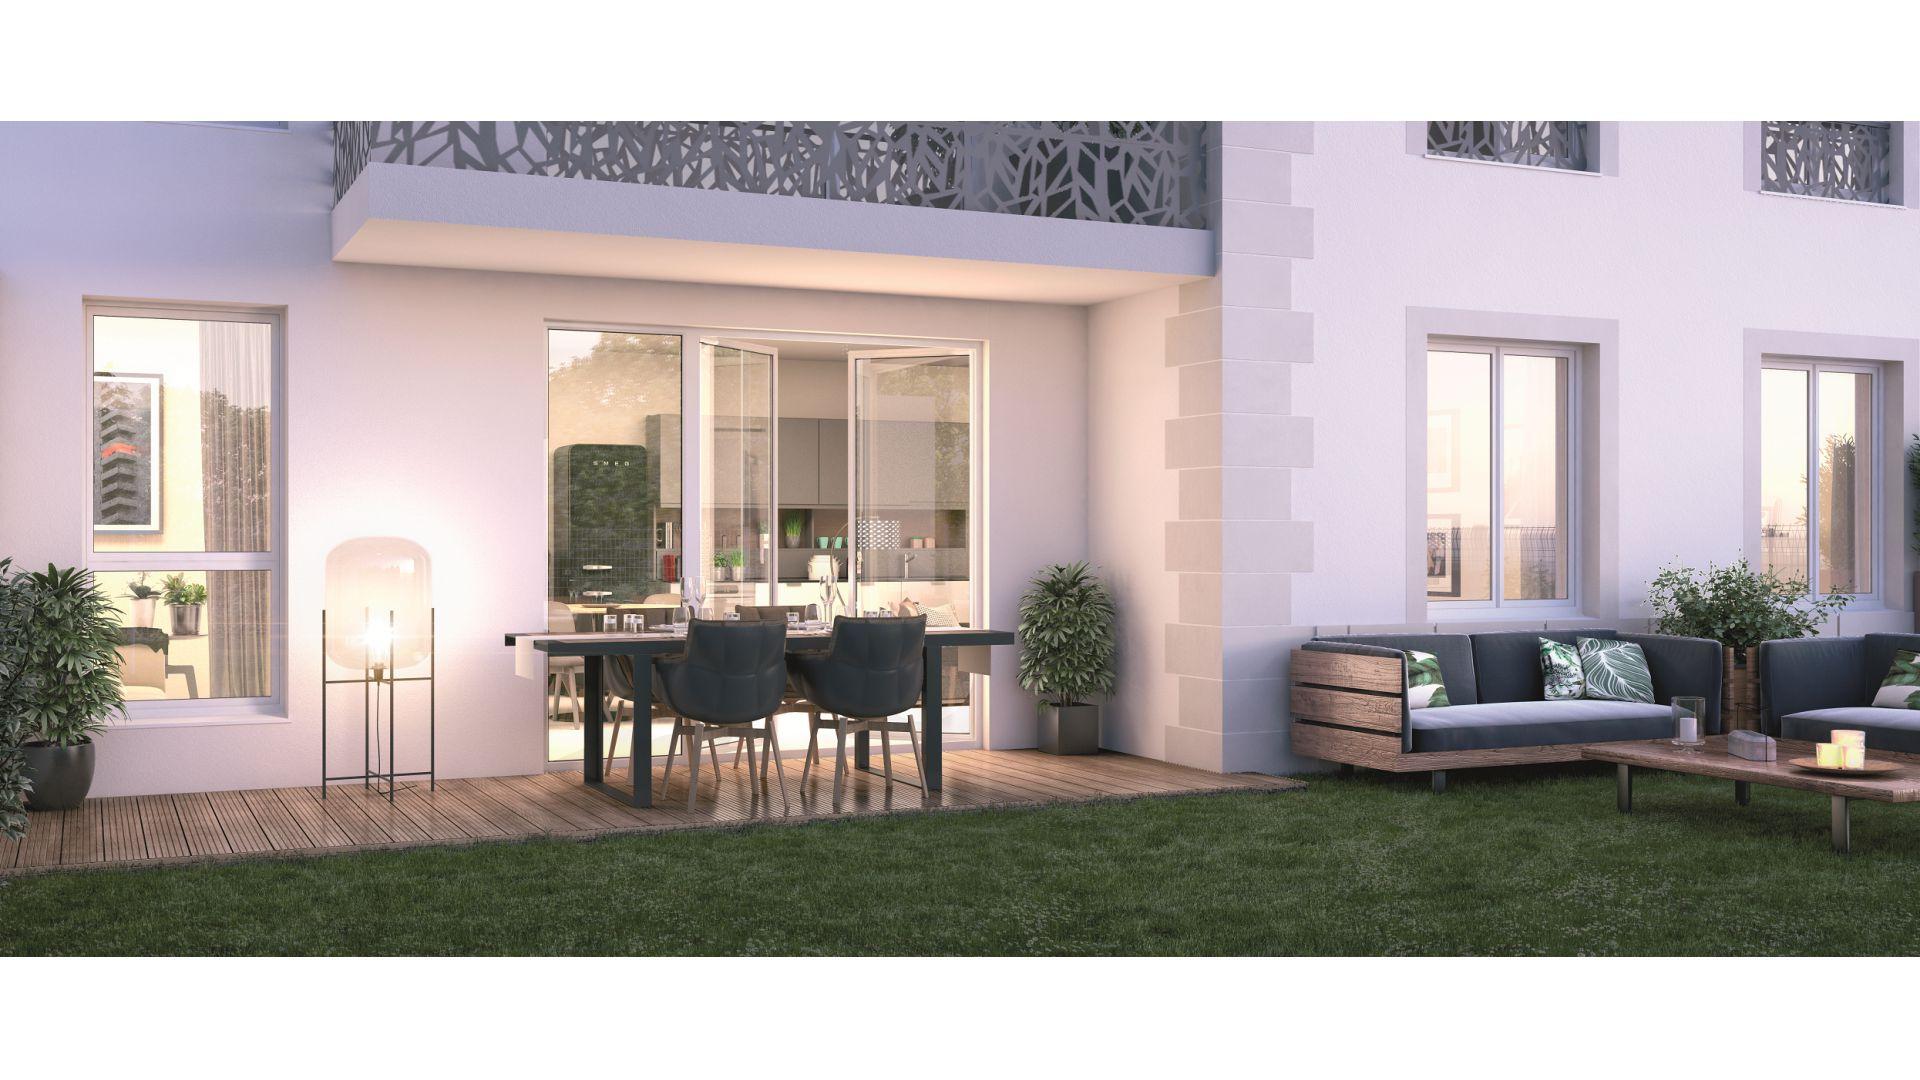 GreenCity immobilier - Vert-Le-Petit - 91710 - résidence Le Green Val - appartements neufs T2 - T3 - T4  - vue terrasse